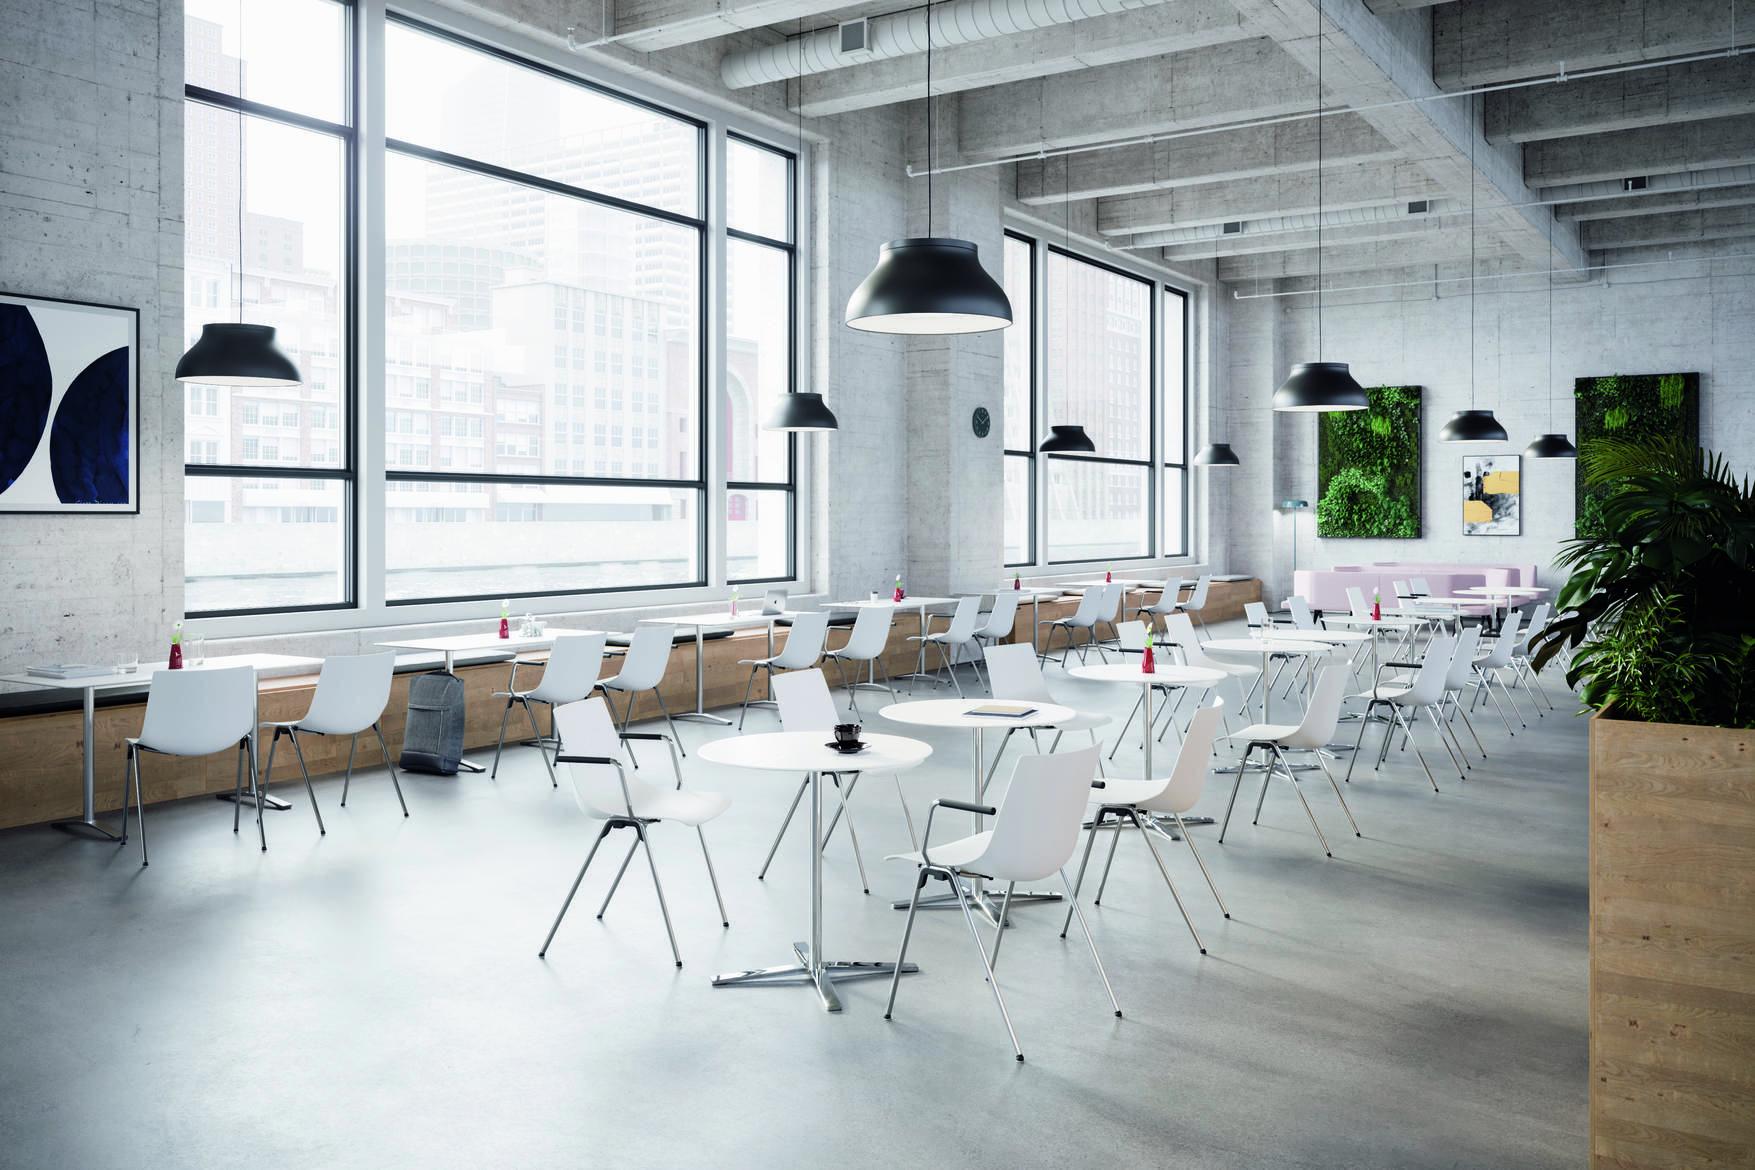 #wilkhahnstyle #wilkhahnusa #innovativedesign #innovation #design #bauhaus #designlovers #innovativeproduct #designawards #ergonomic #chairdesign #seating #officefurniture #furnituredesign #germandesign #officedesign